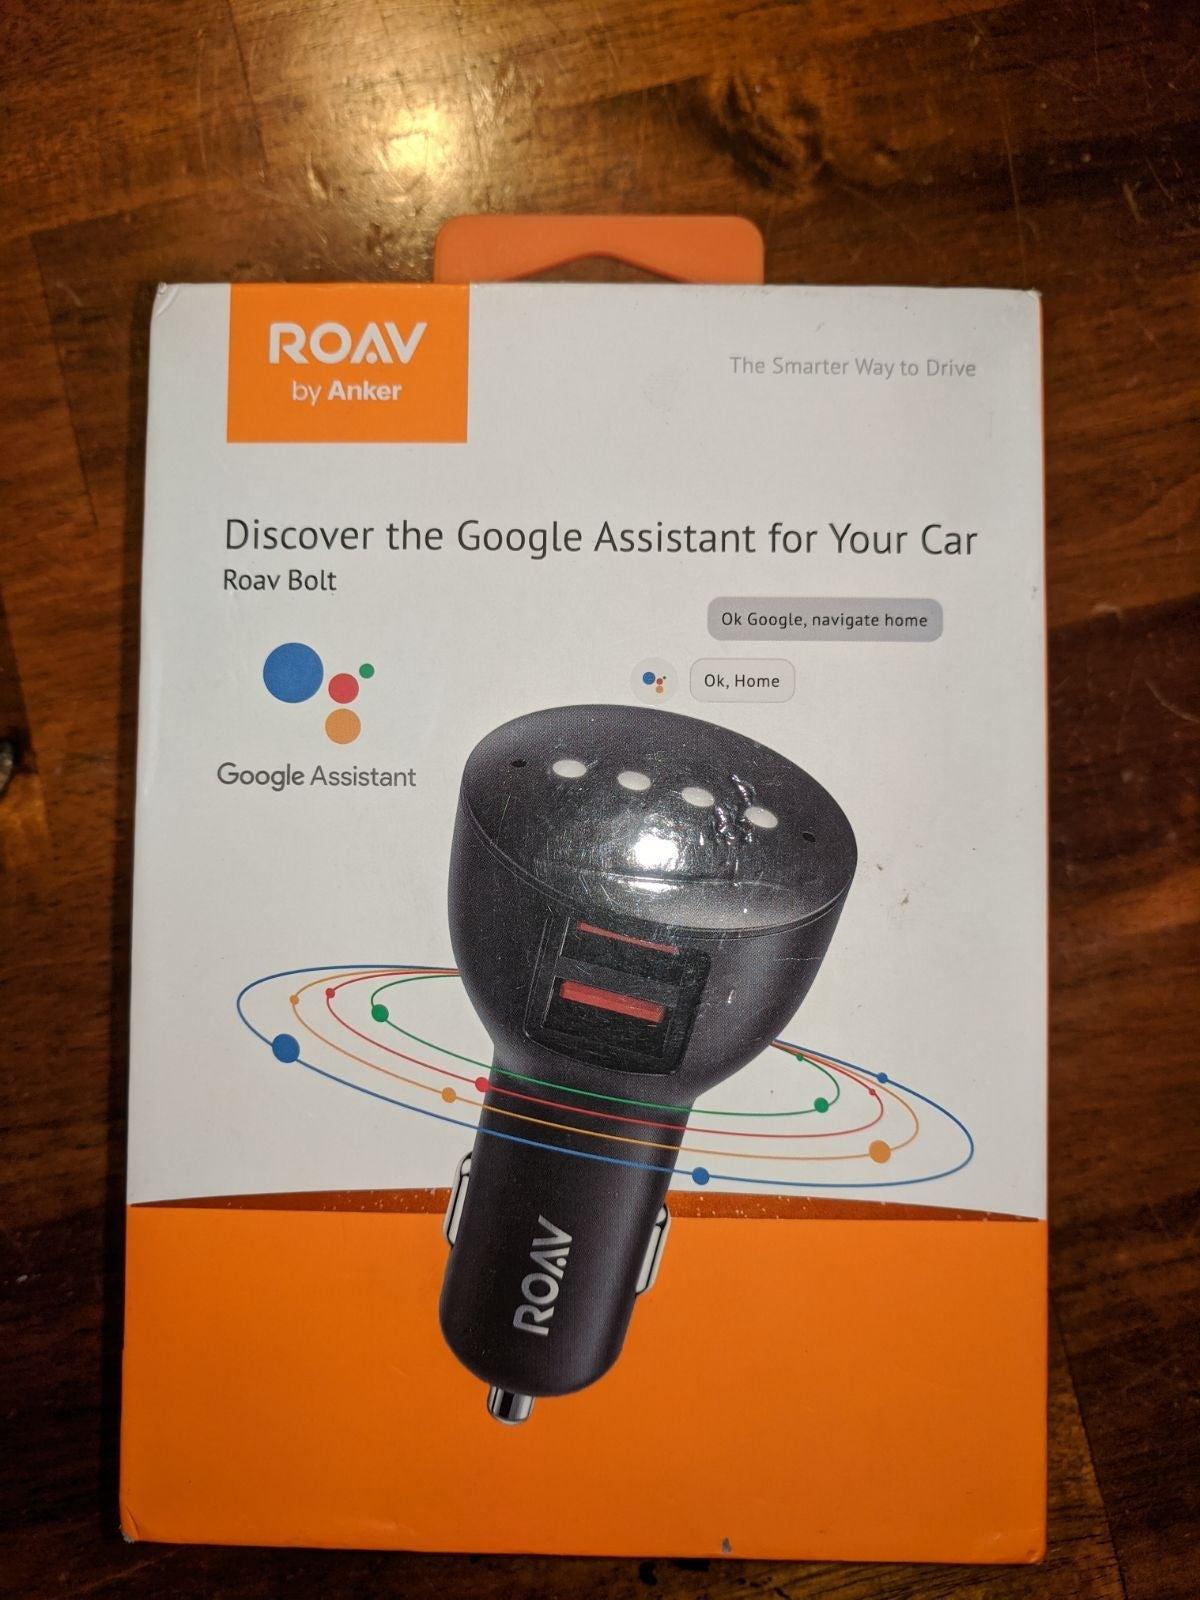 Google Assistant ROAV